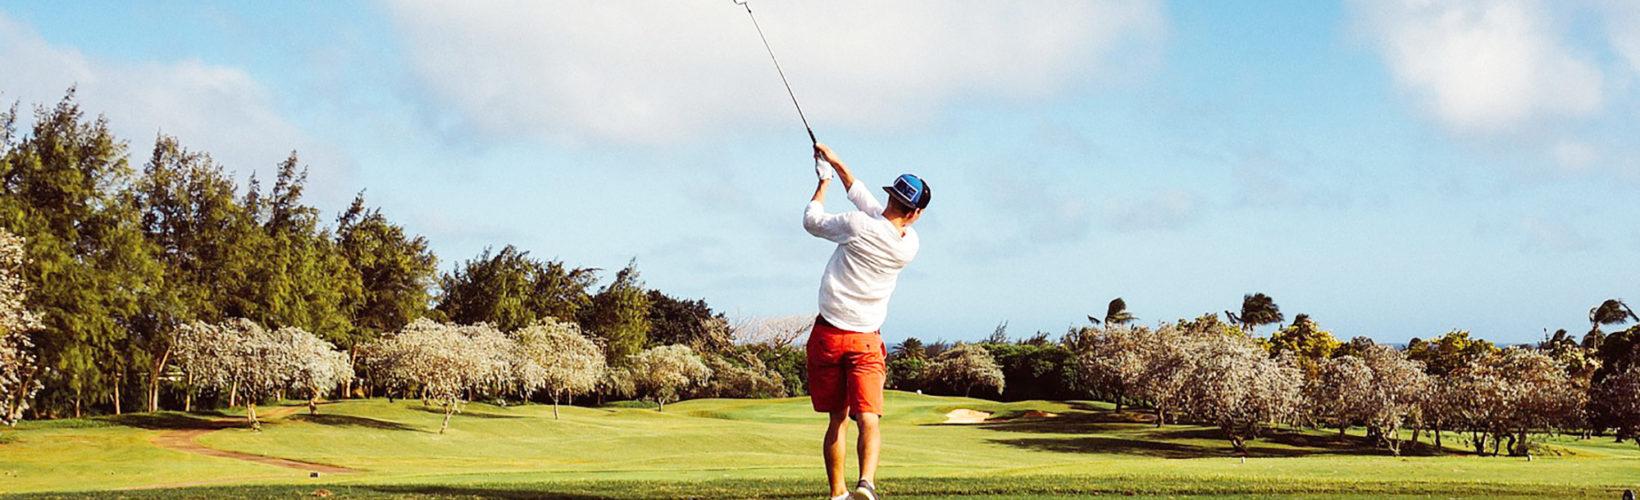 Golfa i Torekov